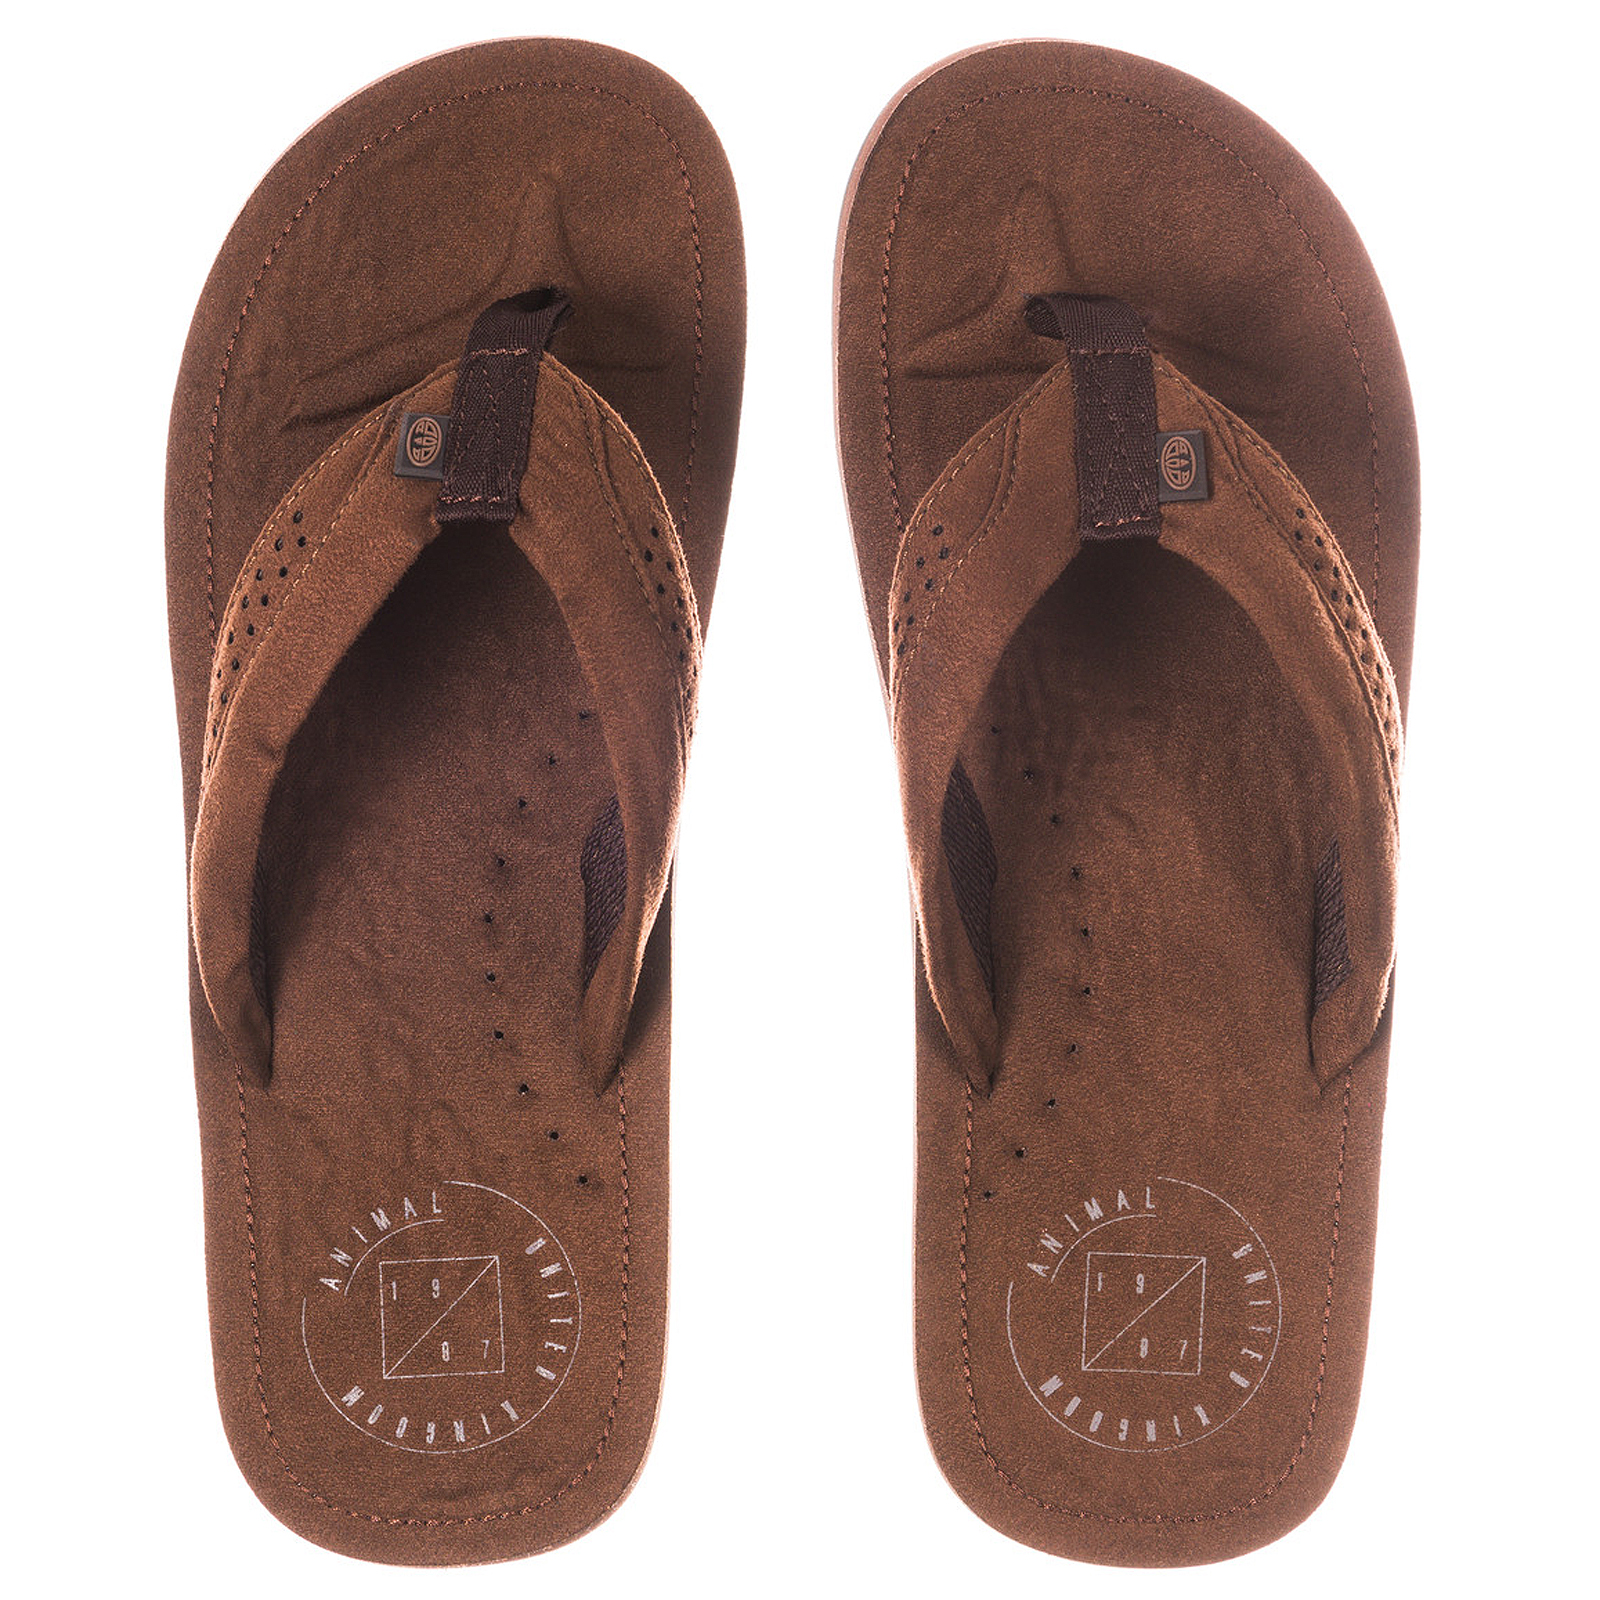 Animal Mens Hyde Summer Beach Holiday Slip On Thongs Sandals Flip Flops